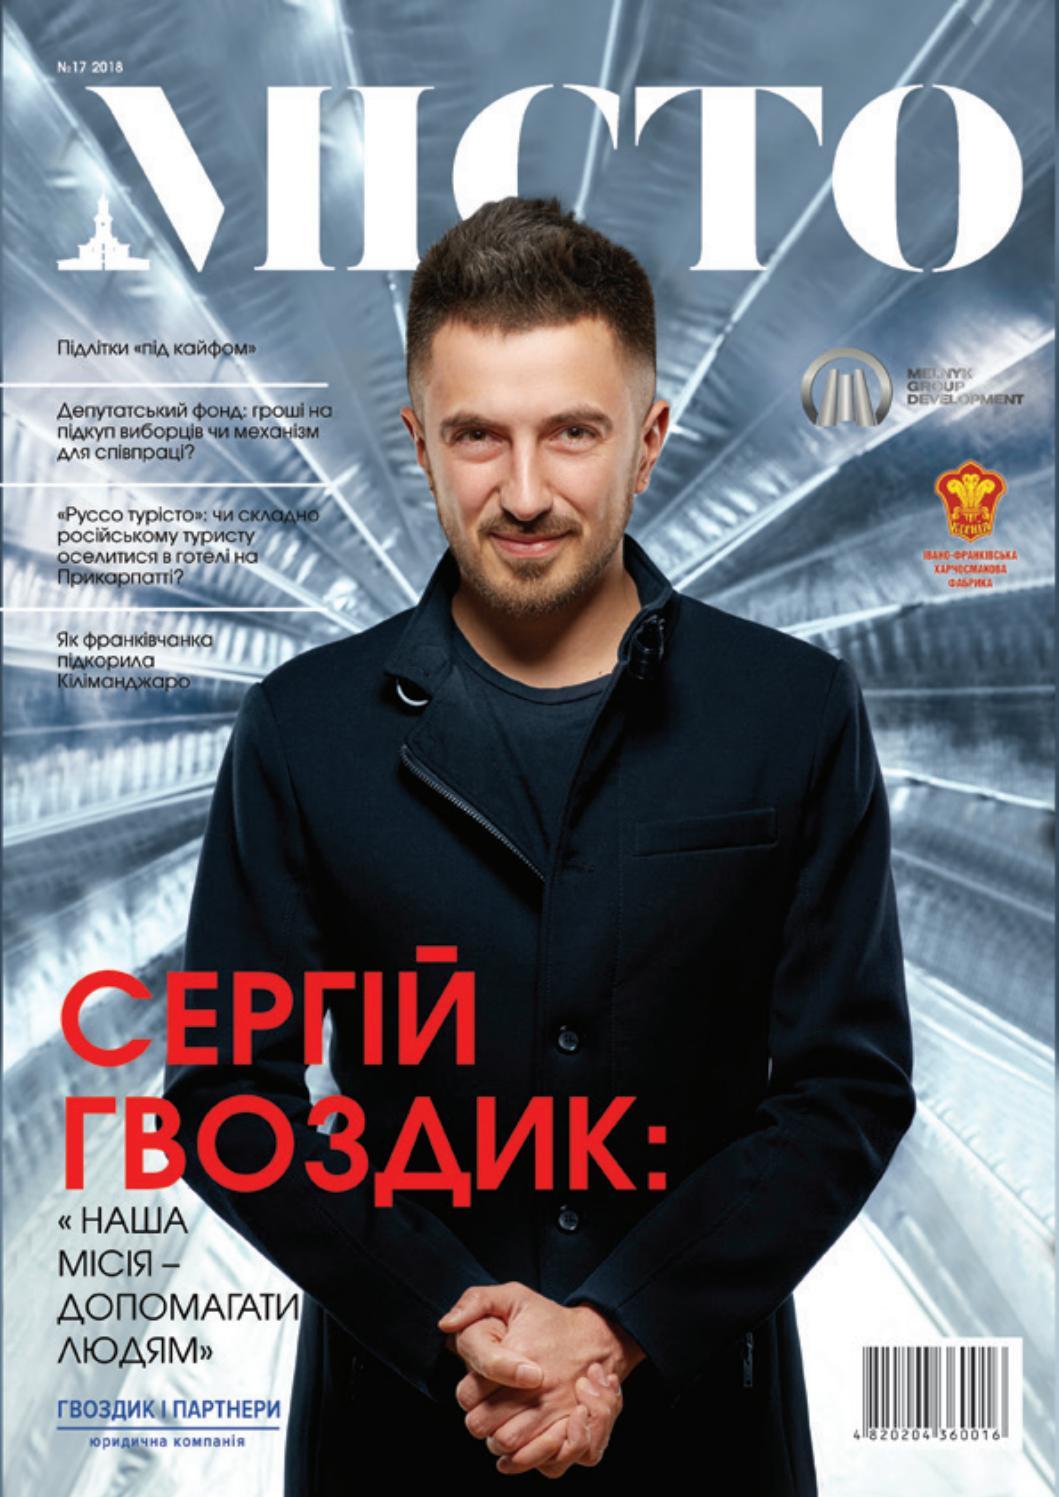 Журнал МІСТО №17 by МІСТО - issuu 429be8710e463